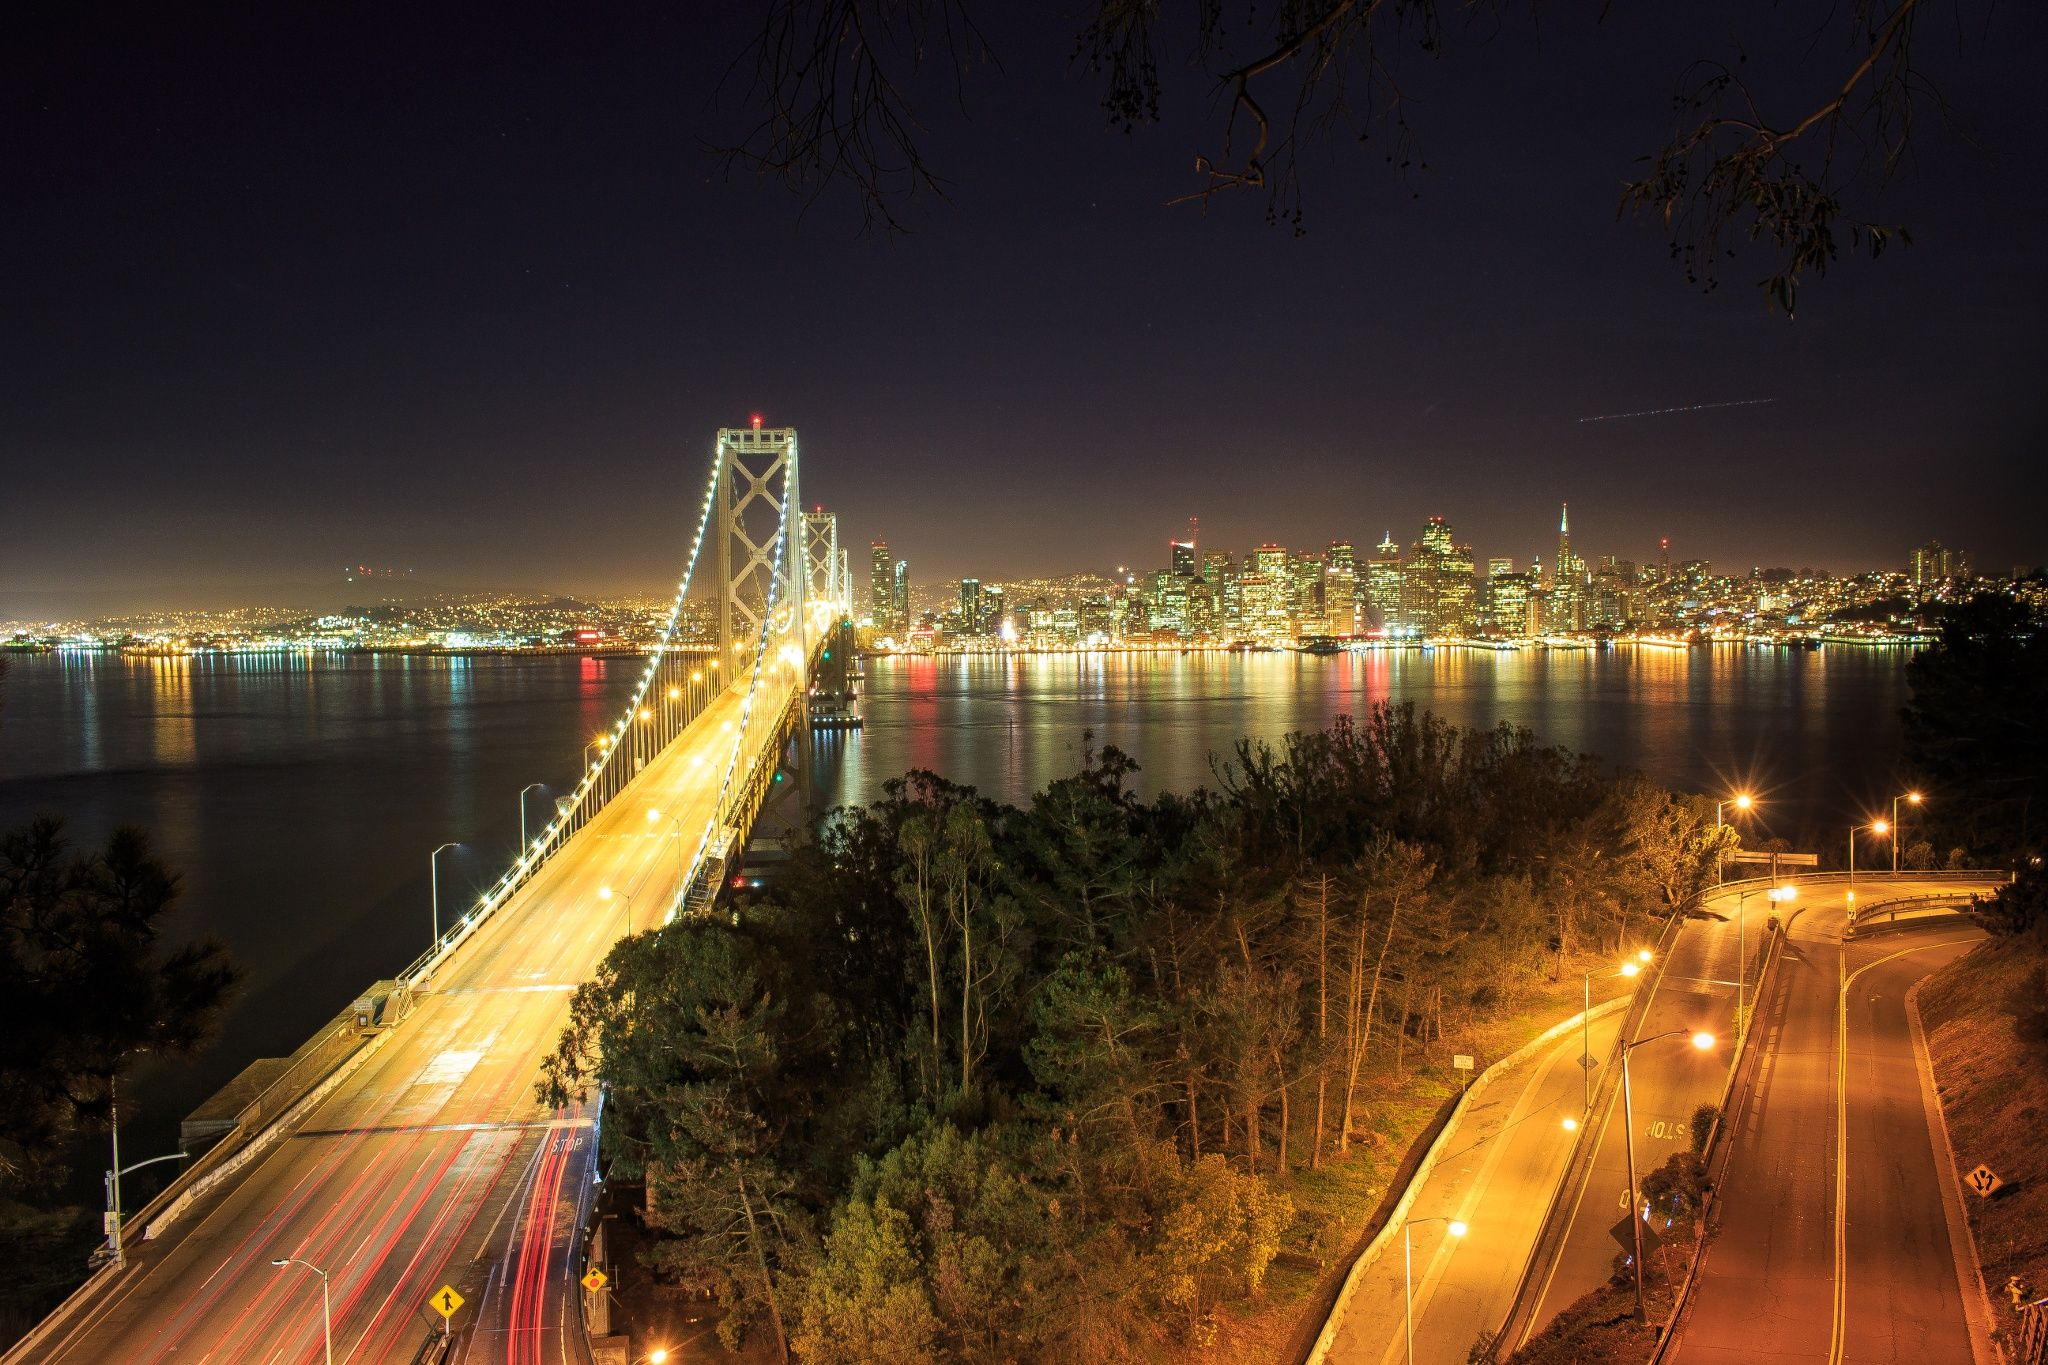 San Francisco from Treasure Island by Benjamin